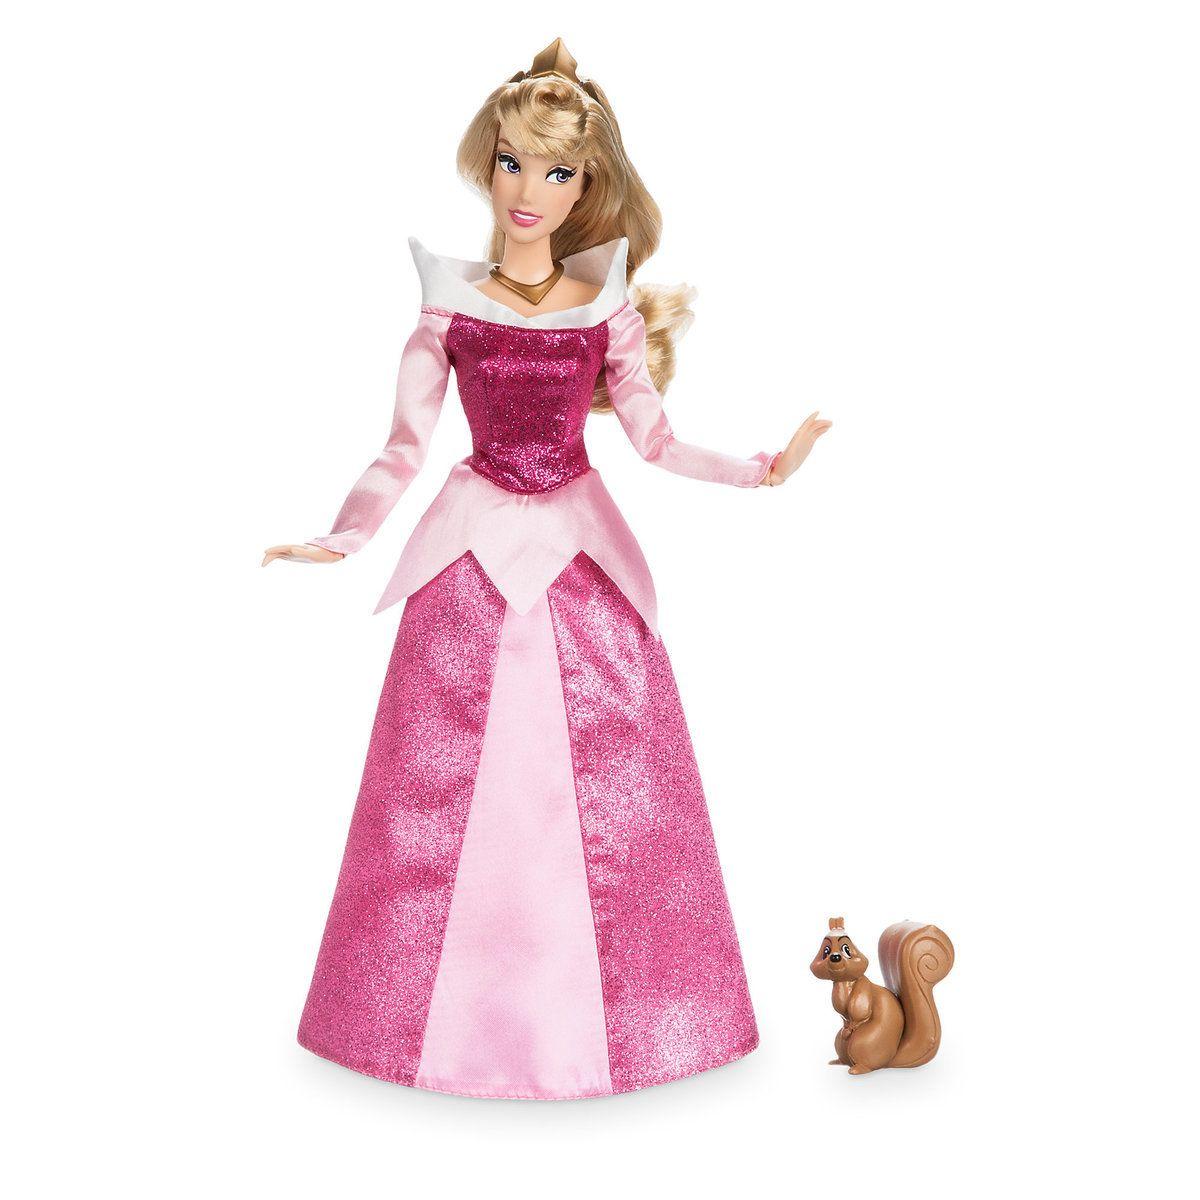 Disney Sleeping Beauty Aurora Doll With Squirrel Figure New in Box